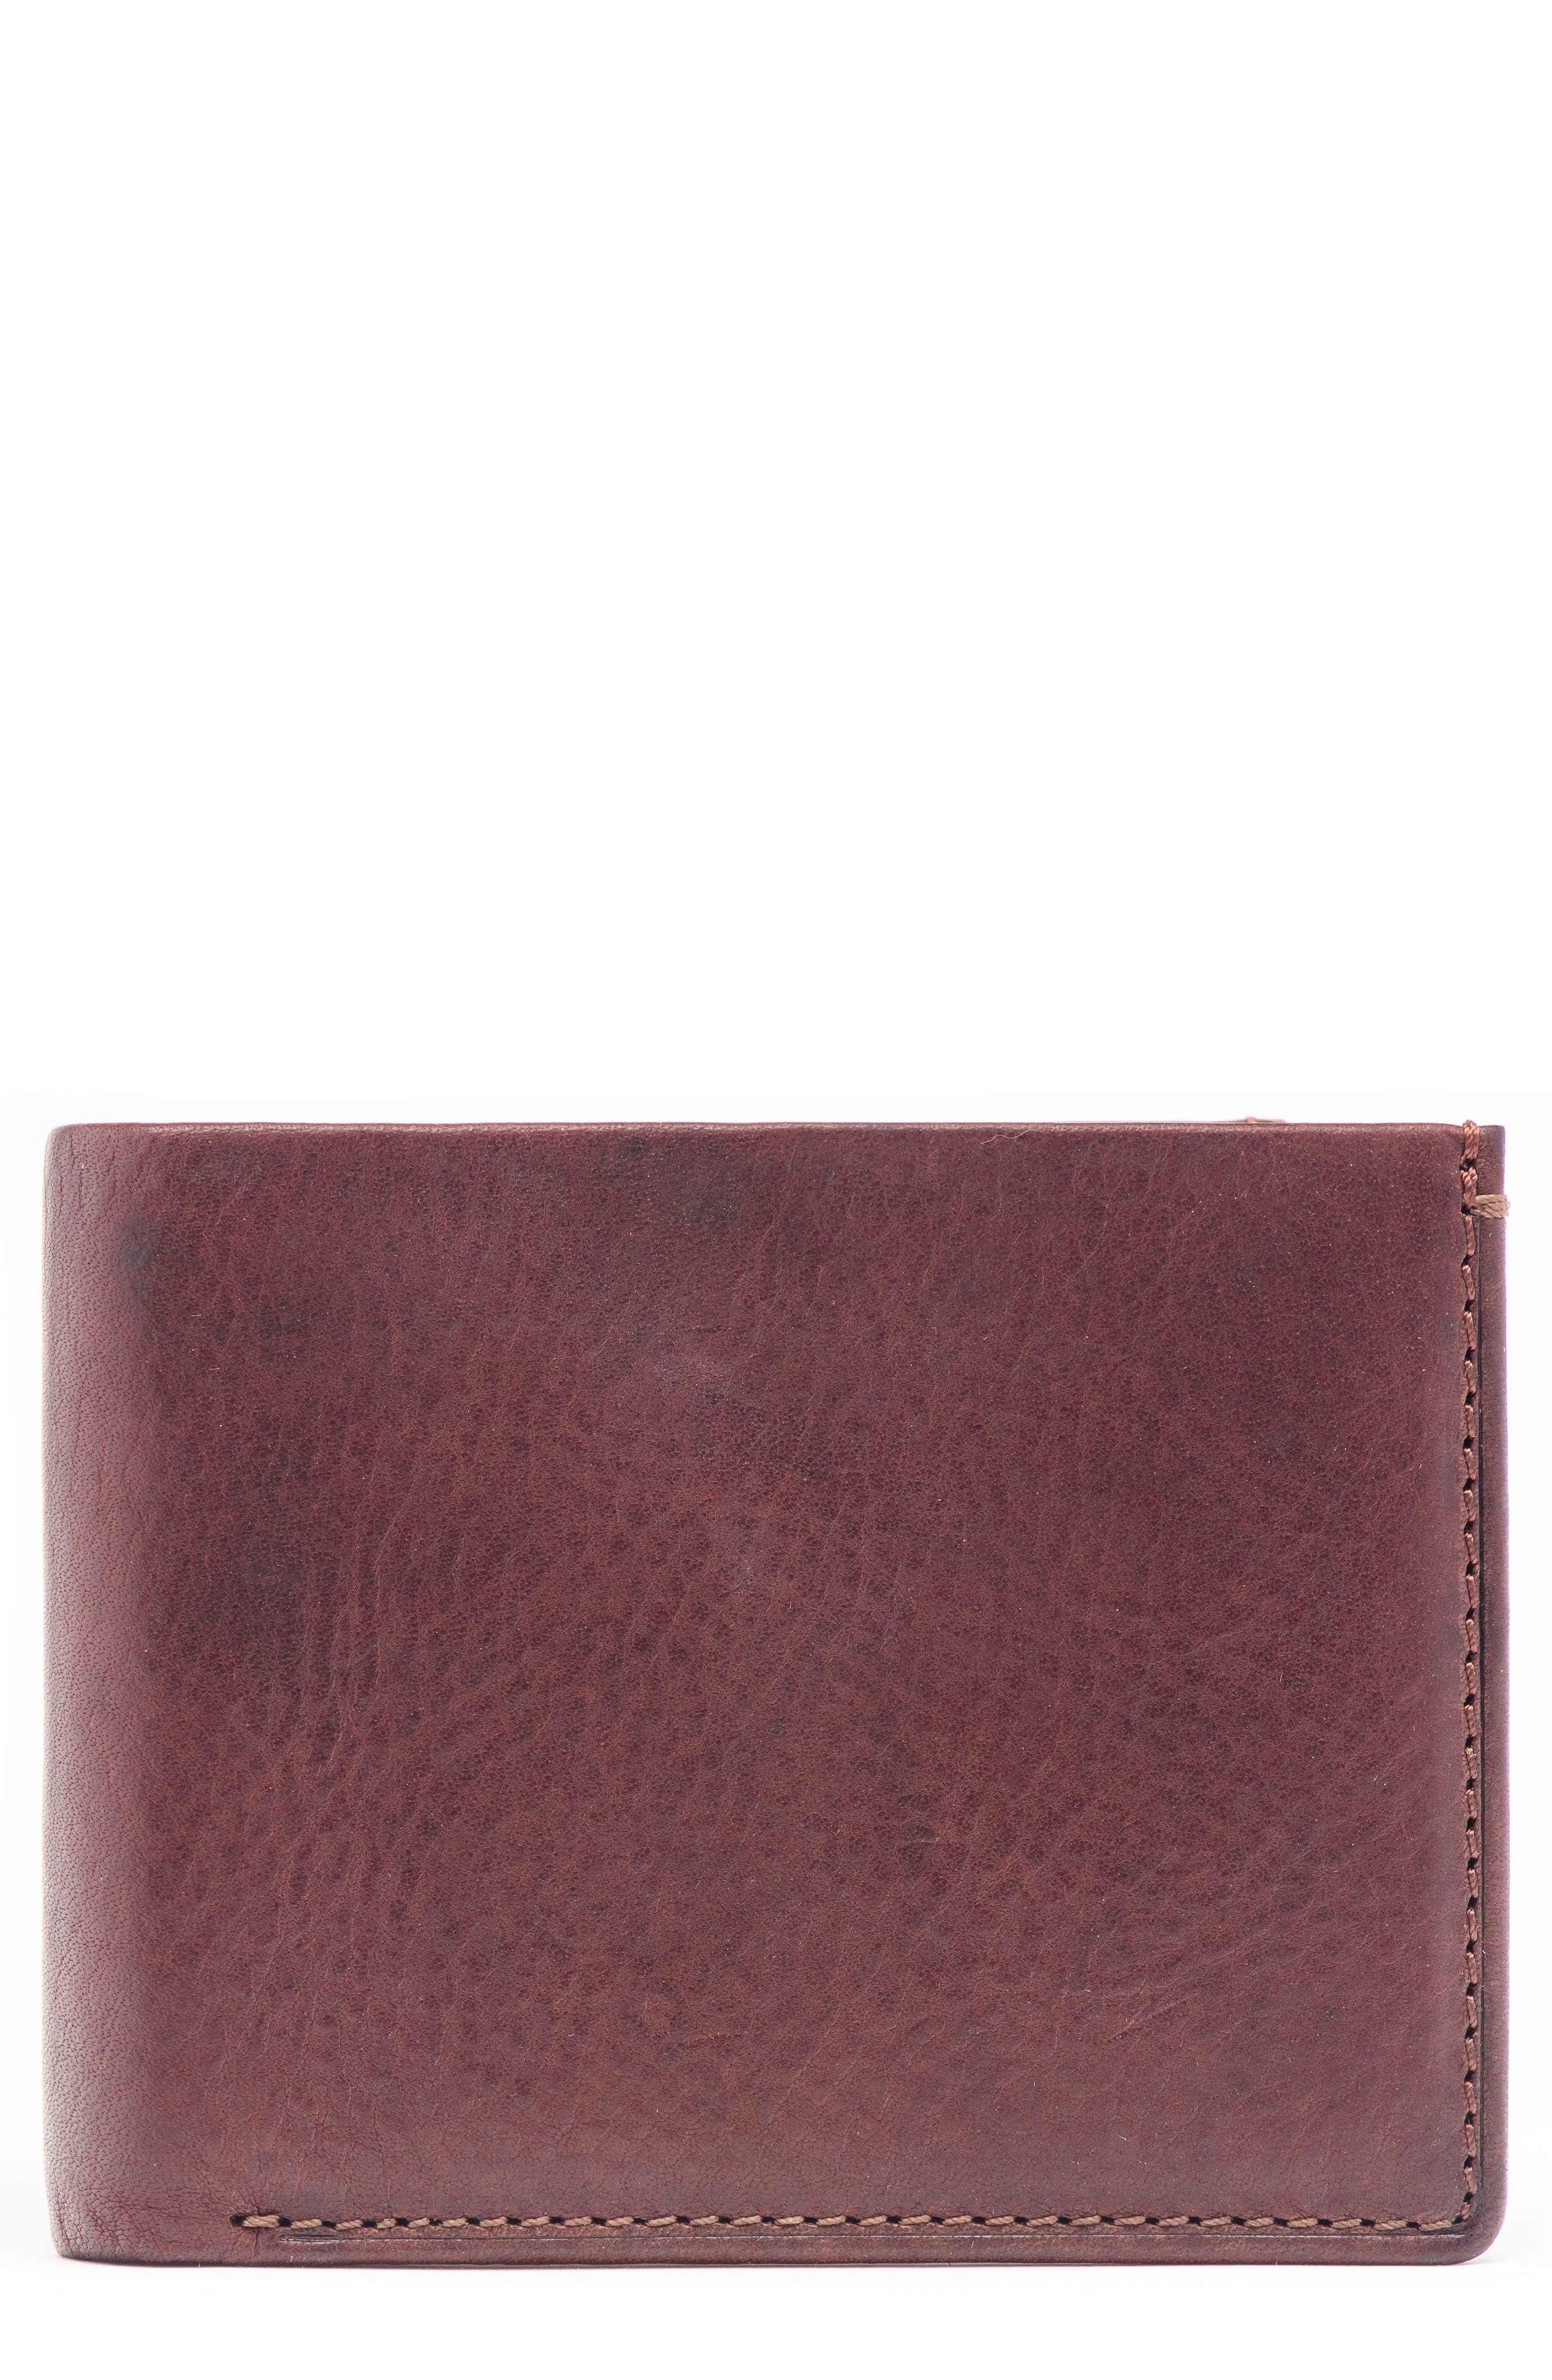 Leather & Denim Bifold Wallet,                             Main thumbnail 1, color,